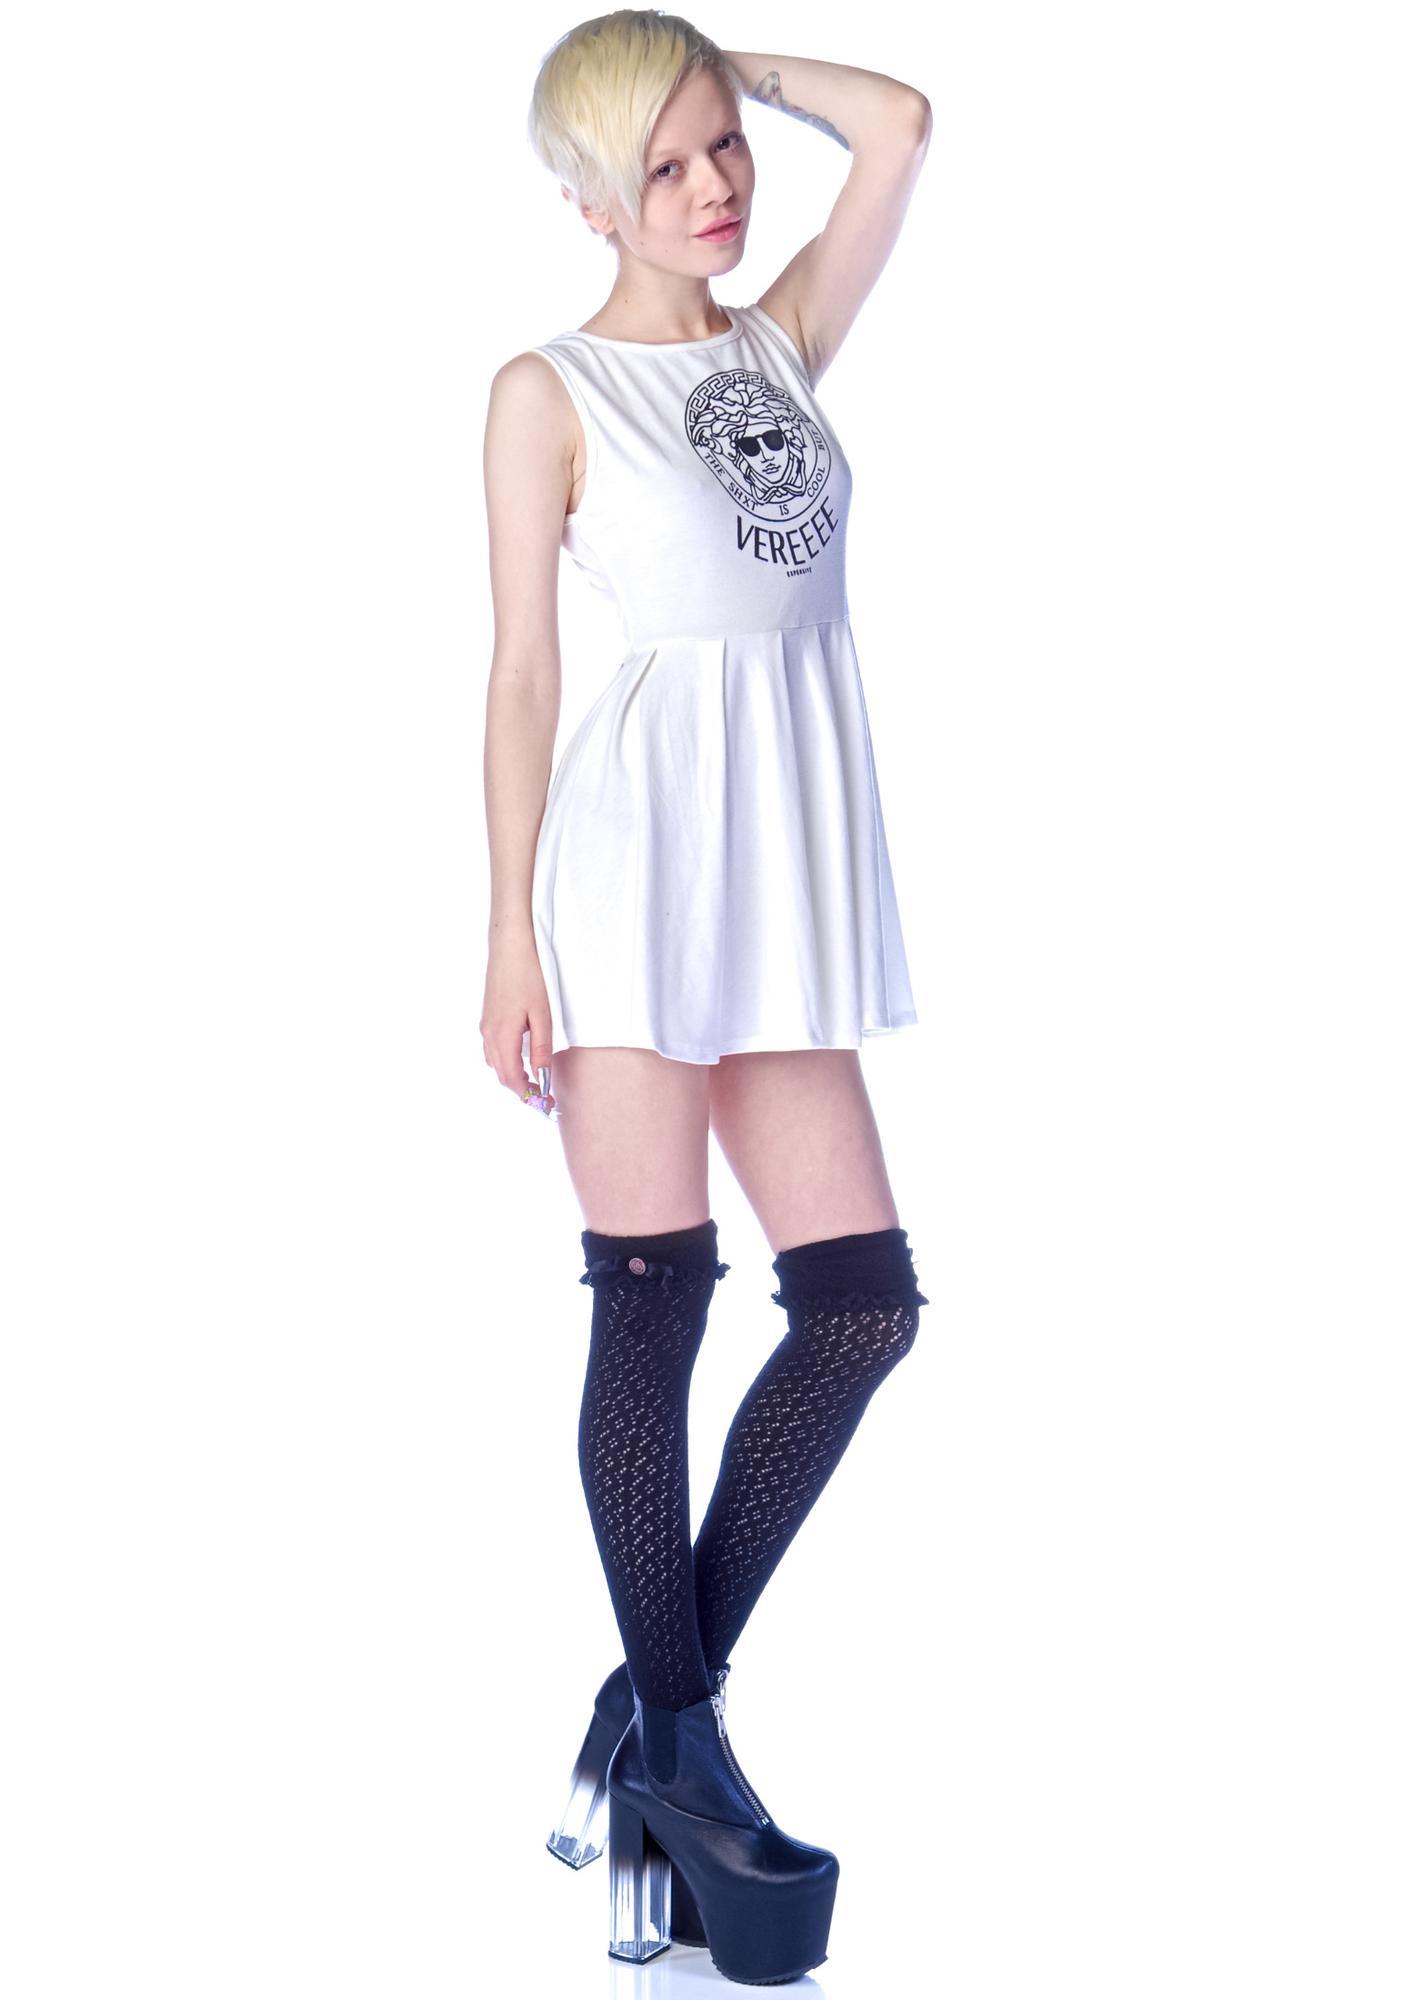 O Mighty Vereee Dress